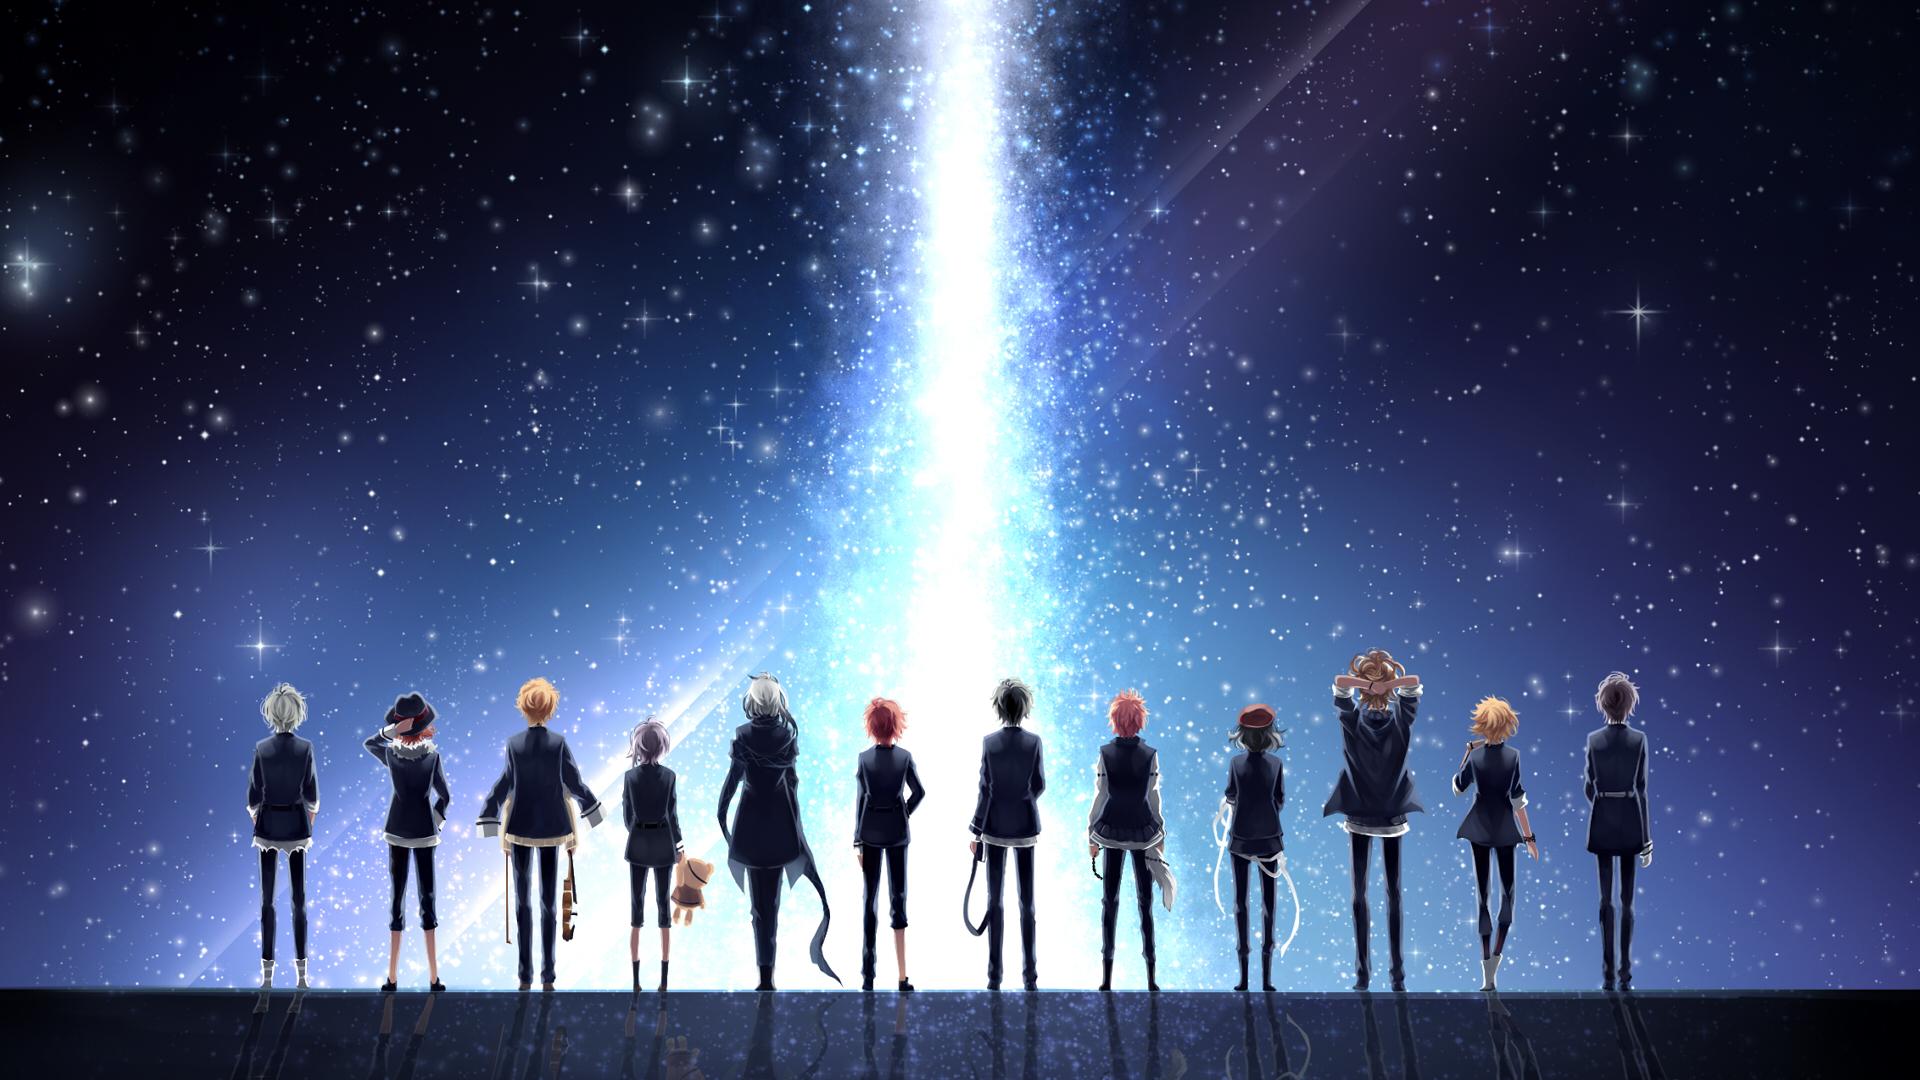 sakamaki kanato, wallpaper - zerochan anime image board